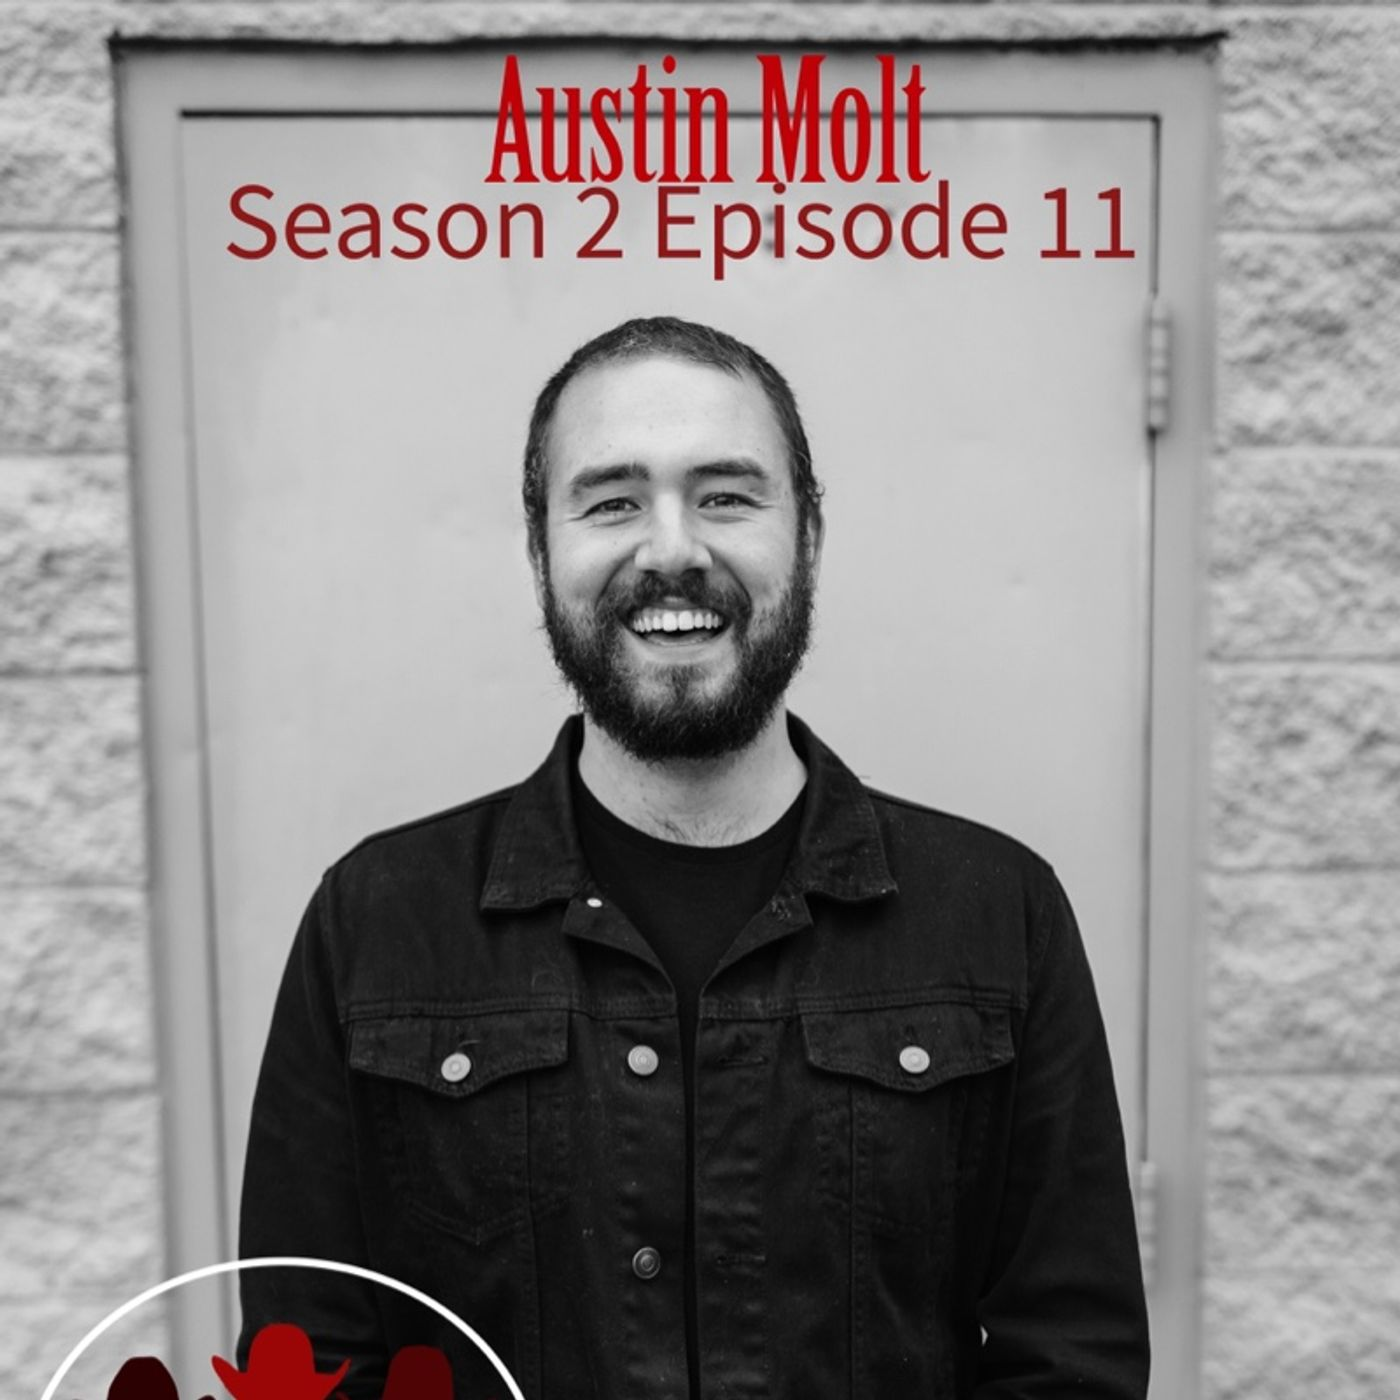 Season 2 Episode 11 - It's All Manure Part 2 with Austin Molt